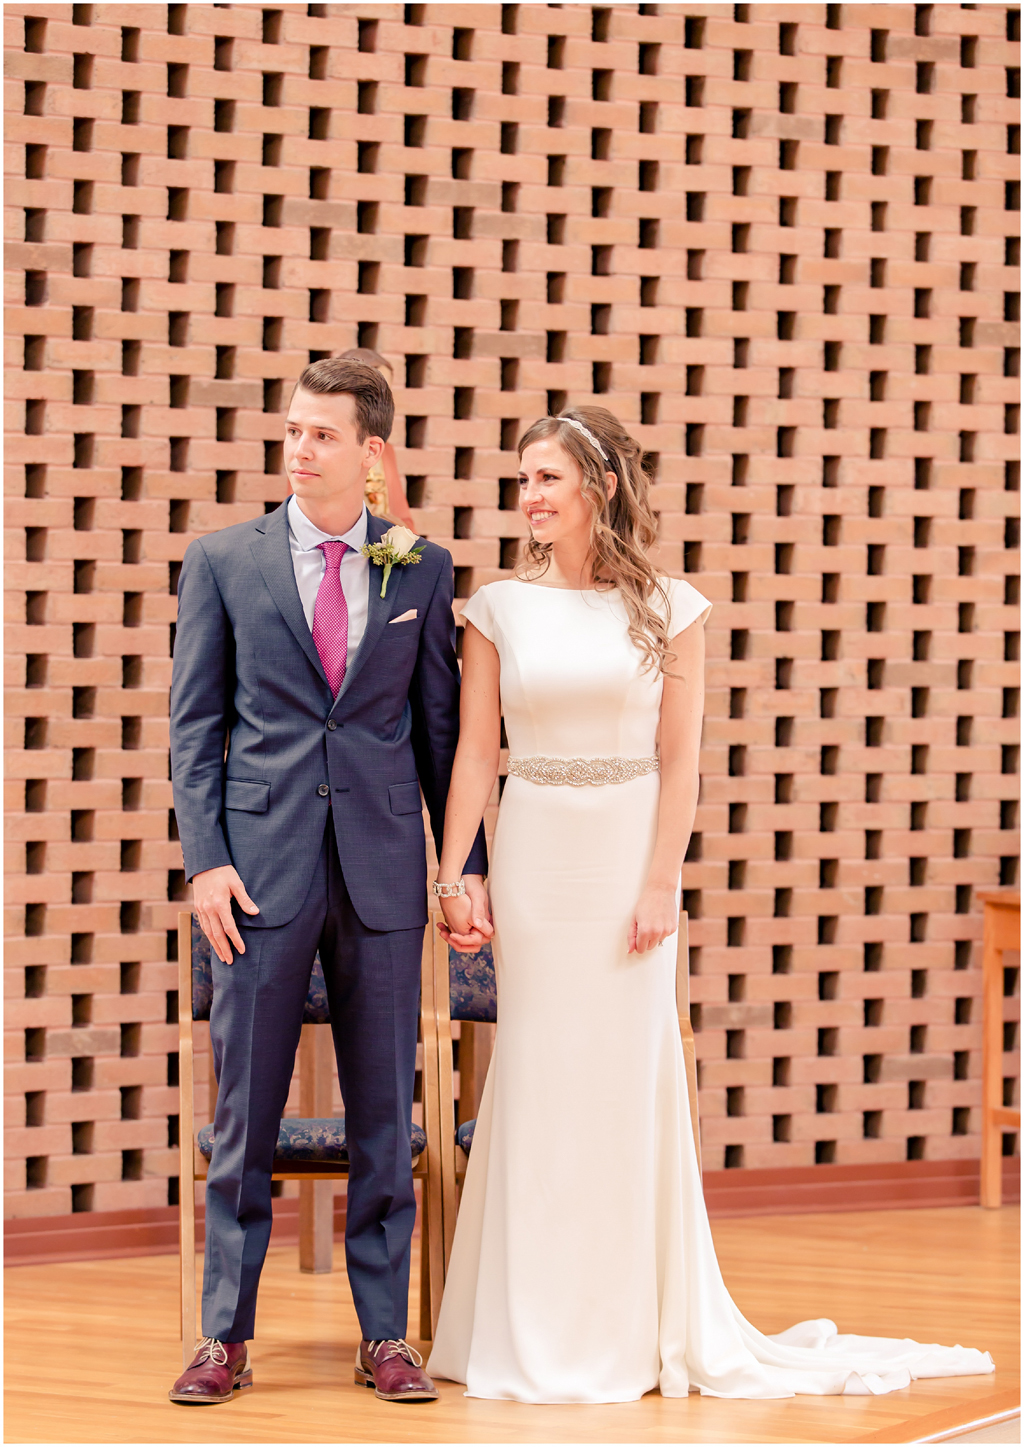 ritz-carlton-georgetown-wedding-washington-dc-photography-liz-stewart-photo-00016